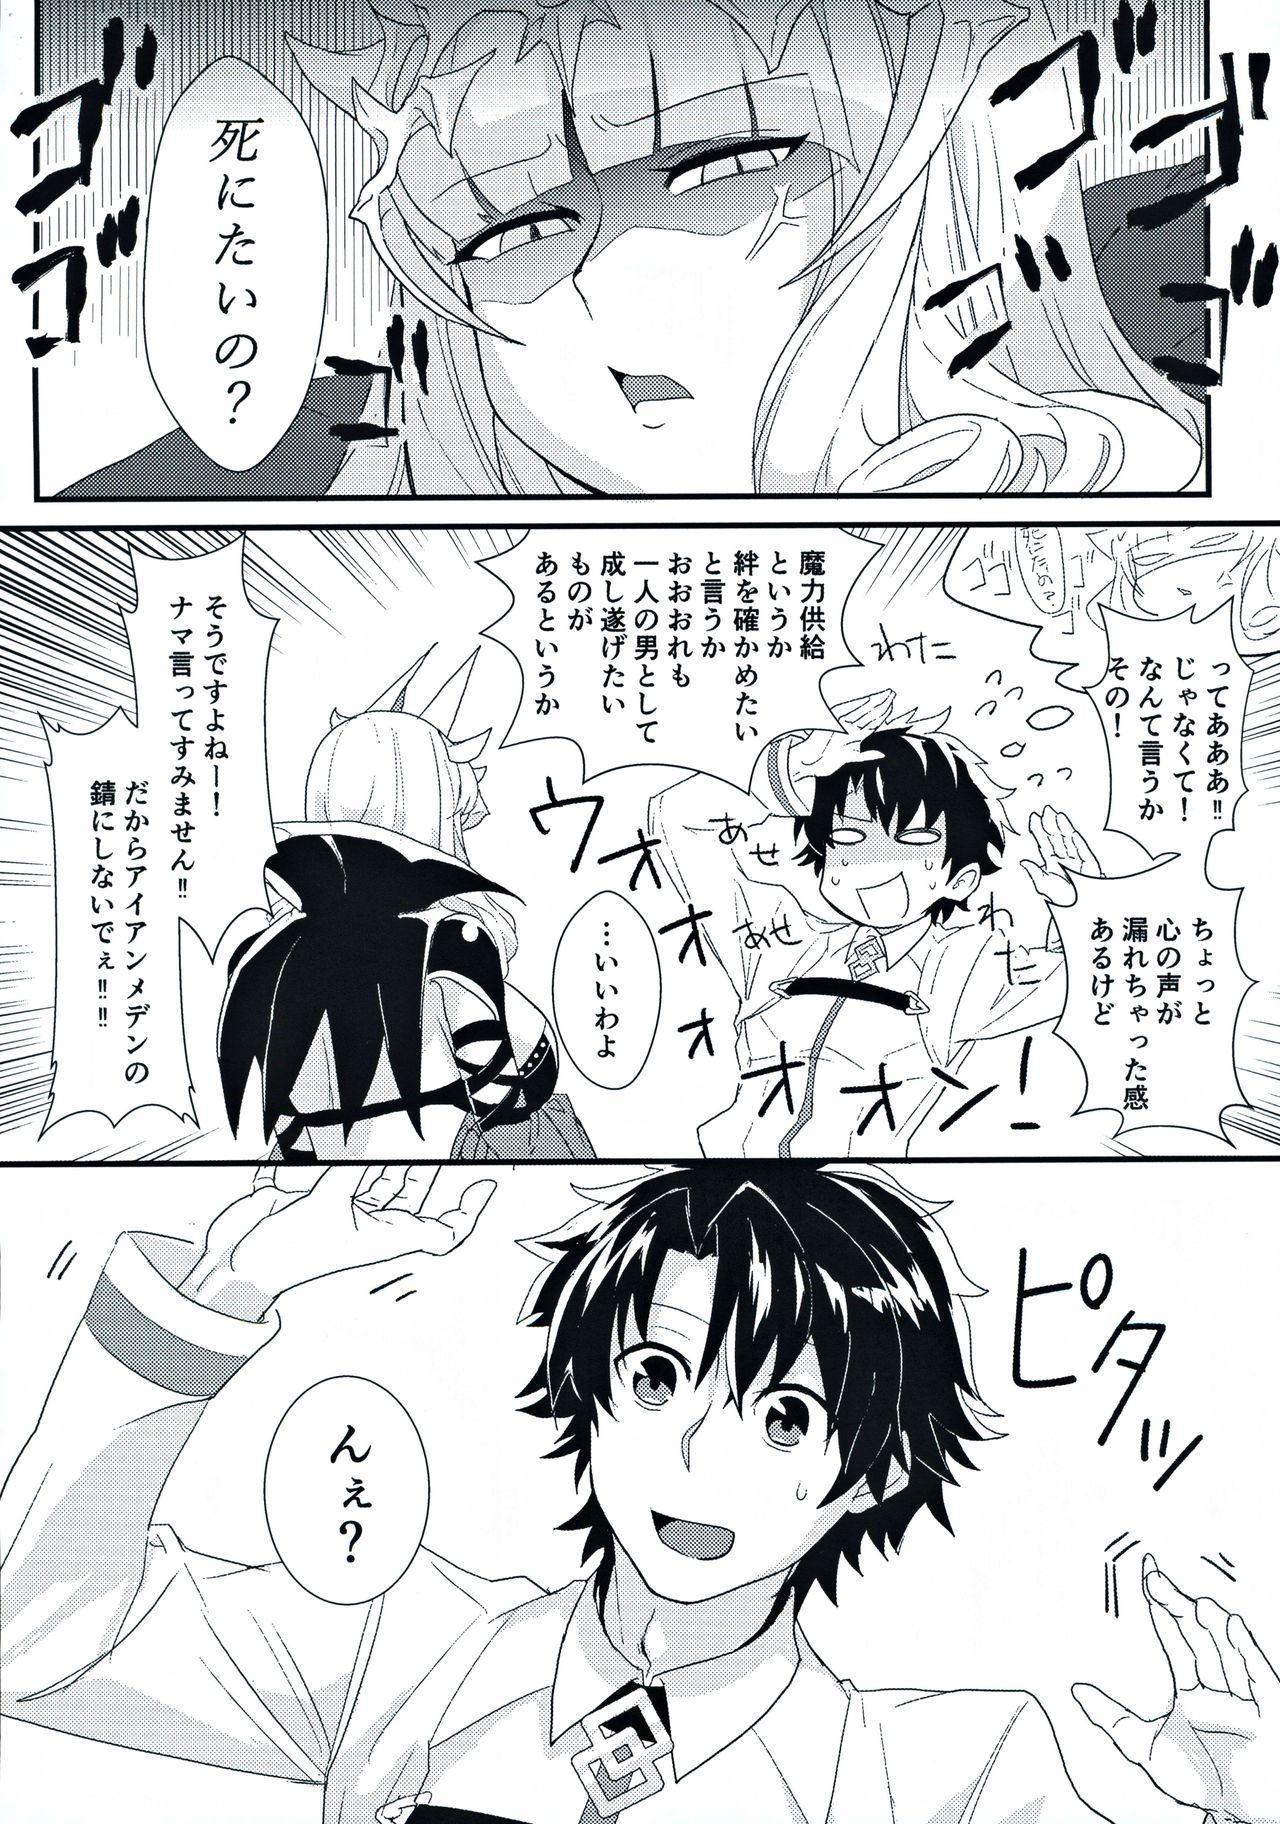 Carmilla-san to Ichaicha Shitai! 4